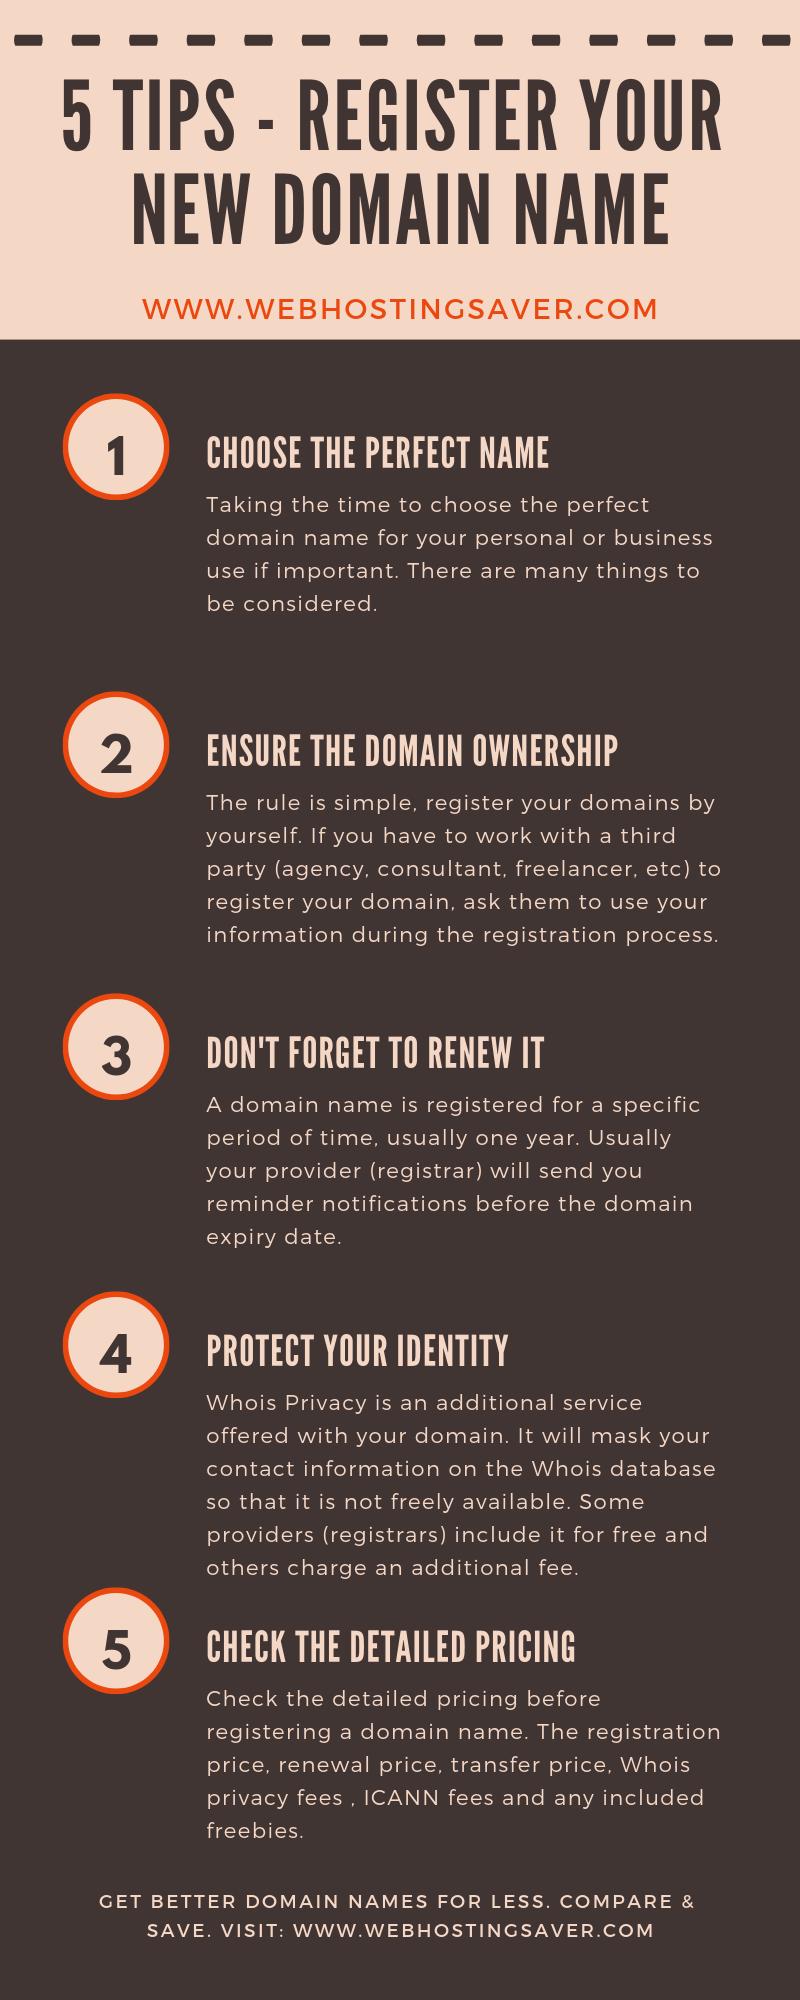 5 Tips - Register Your Domain Name | WebHostingSaver.com